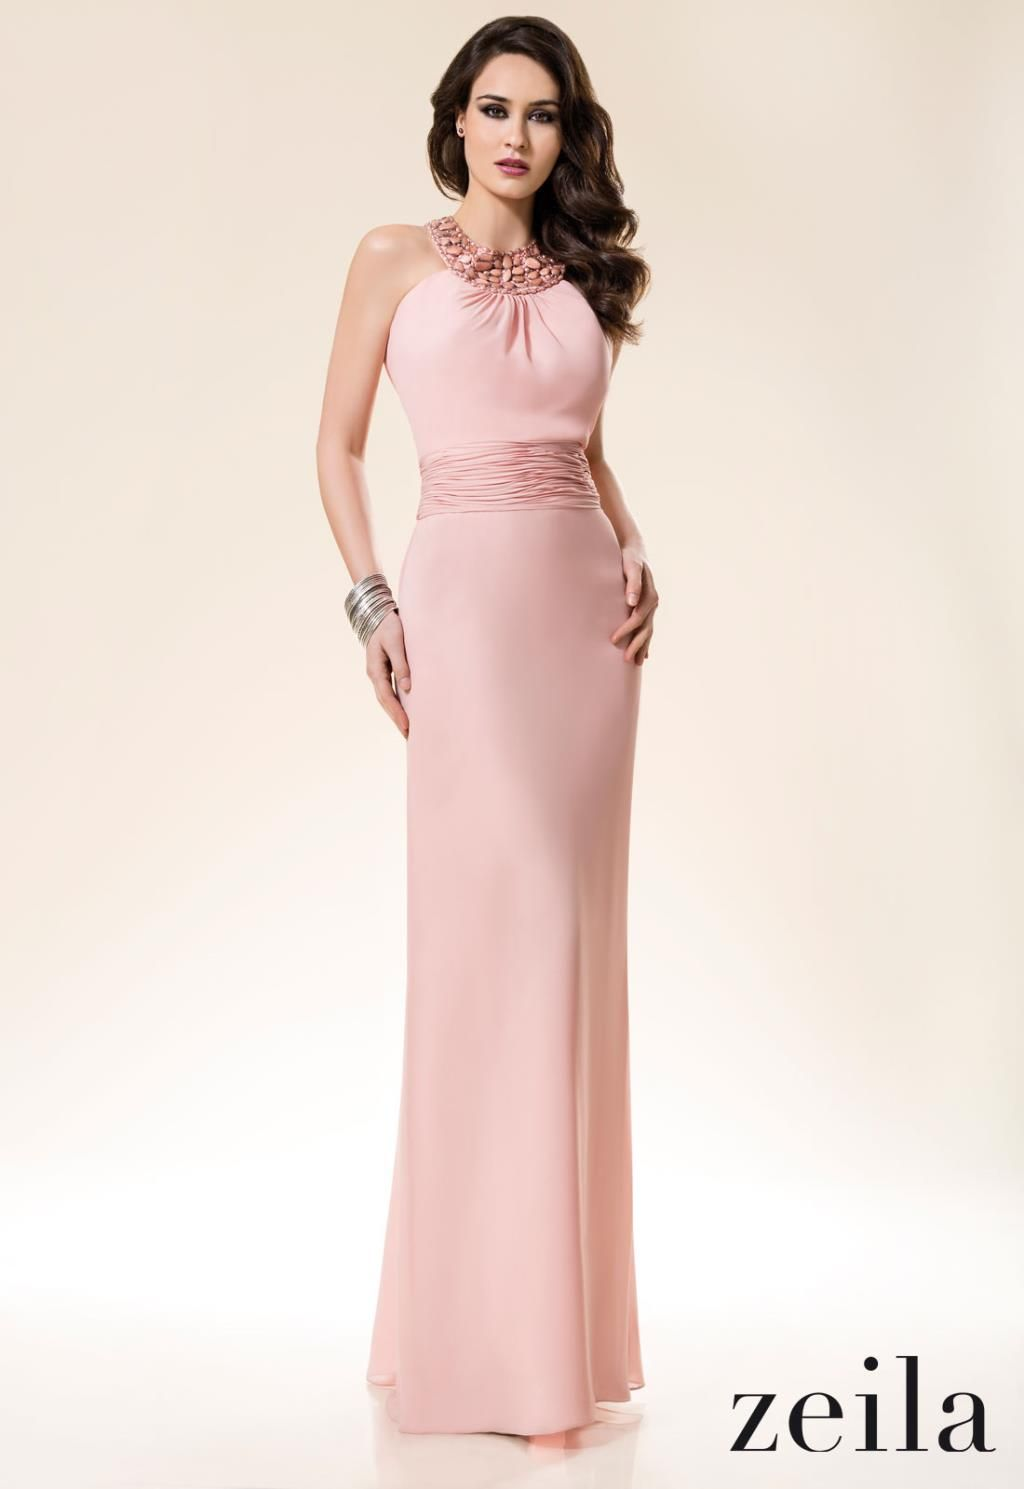 vestido color palo de rosa | Moda | Pinterest | Palo de rosa, Rosas ...